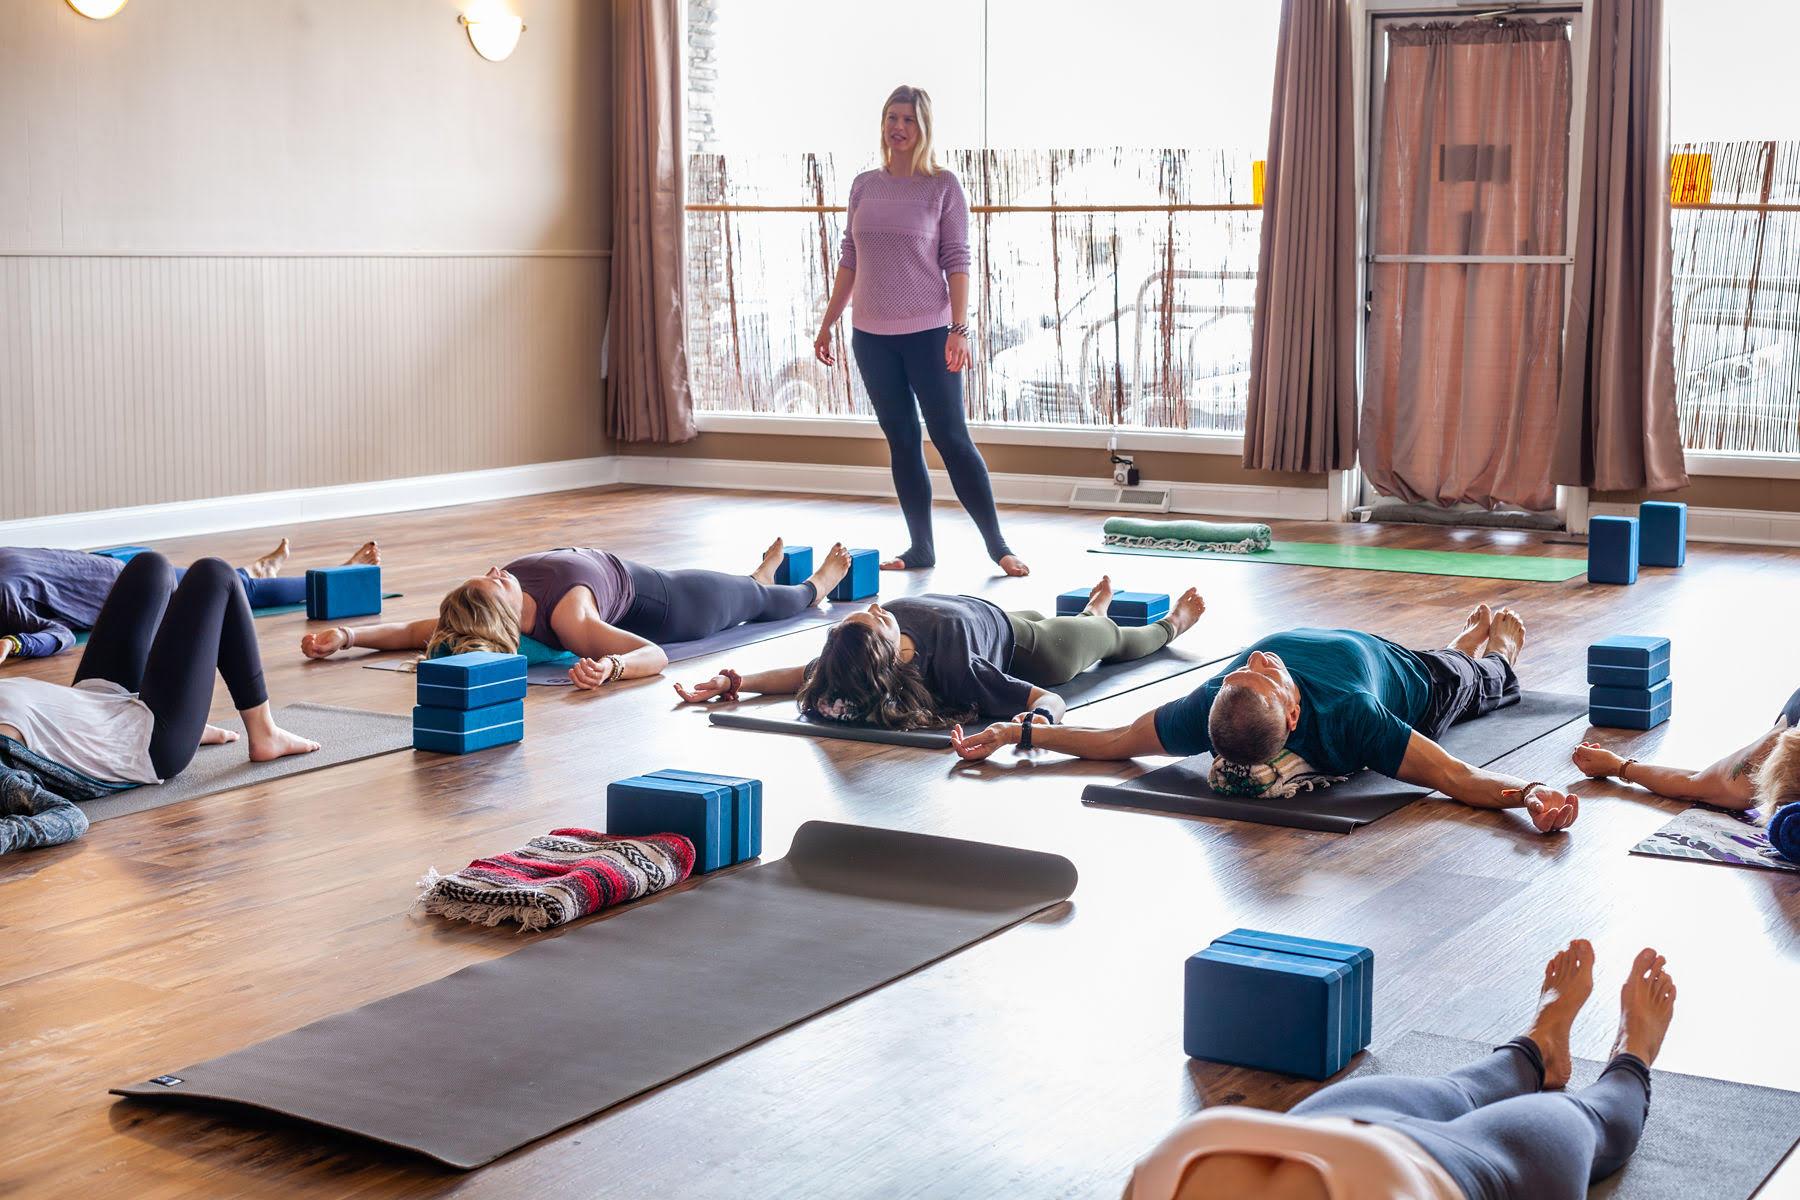 photo credit: Anchor Yoga